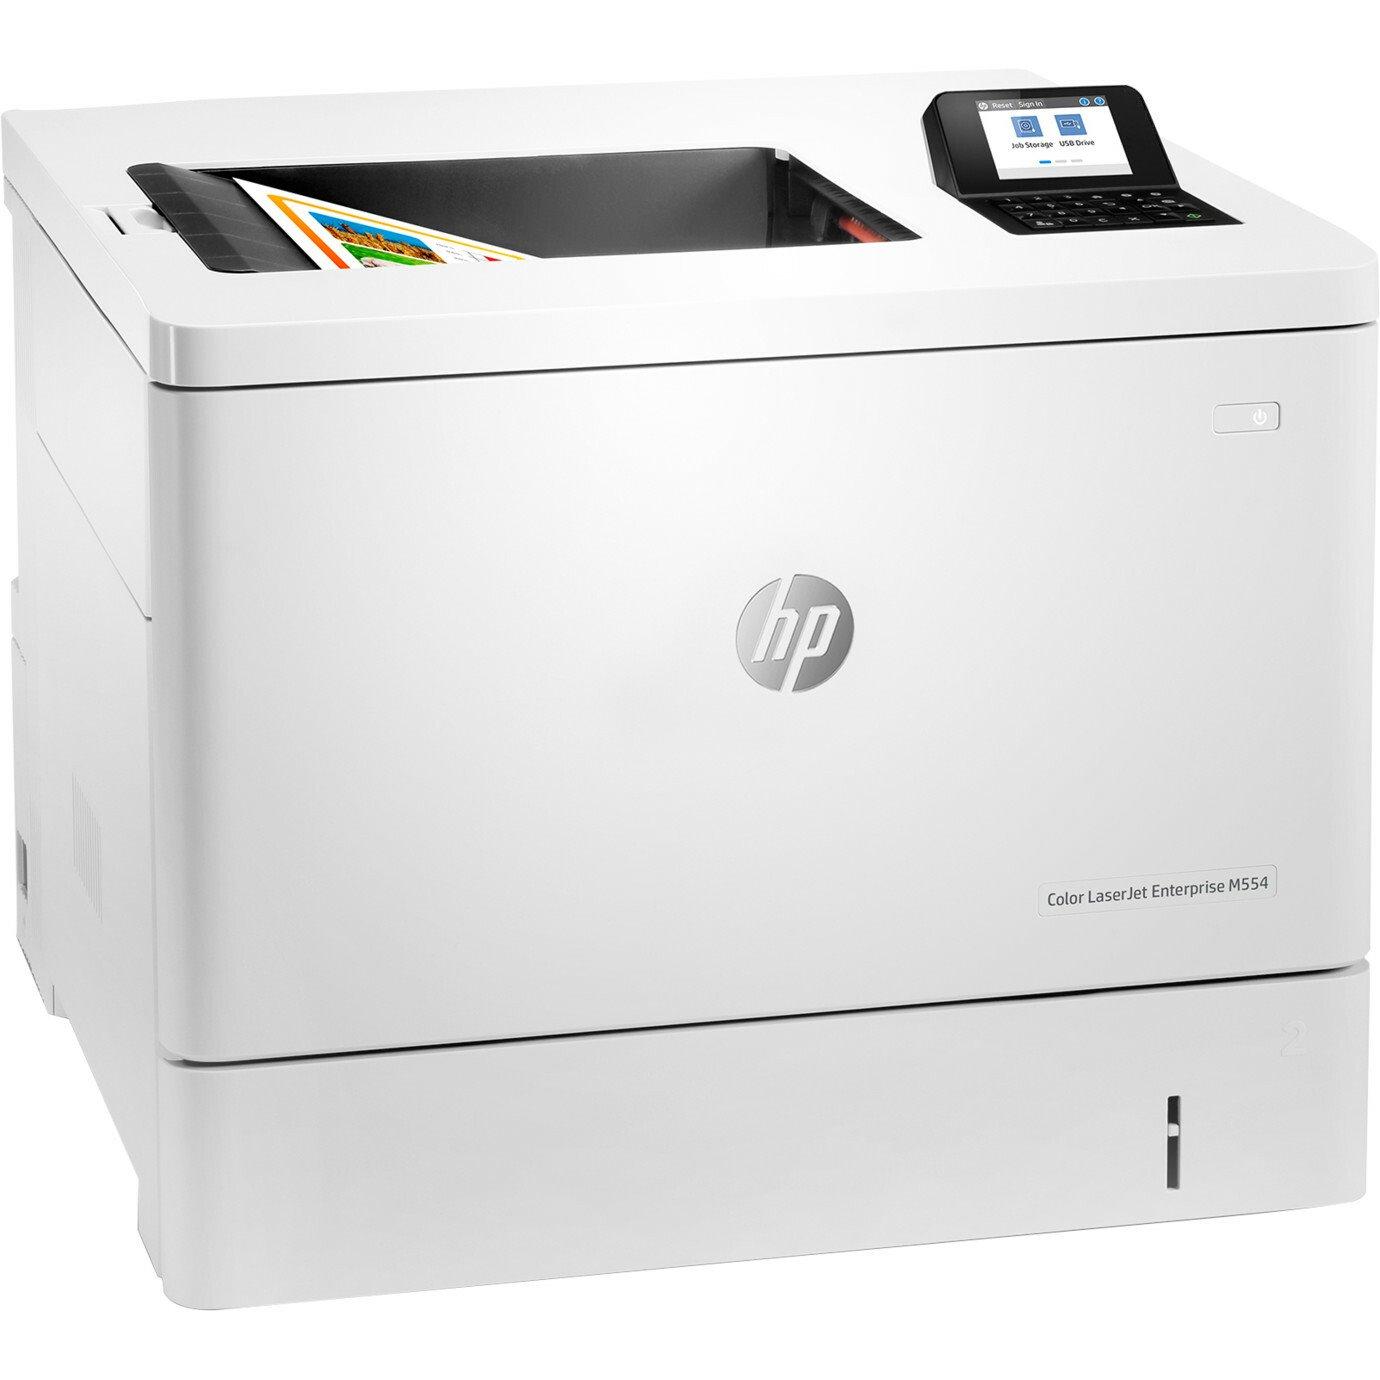 HP LaserJet Enterprise M554 M554dn Desktop Laser Printer - Colour